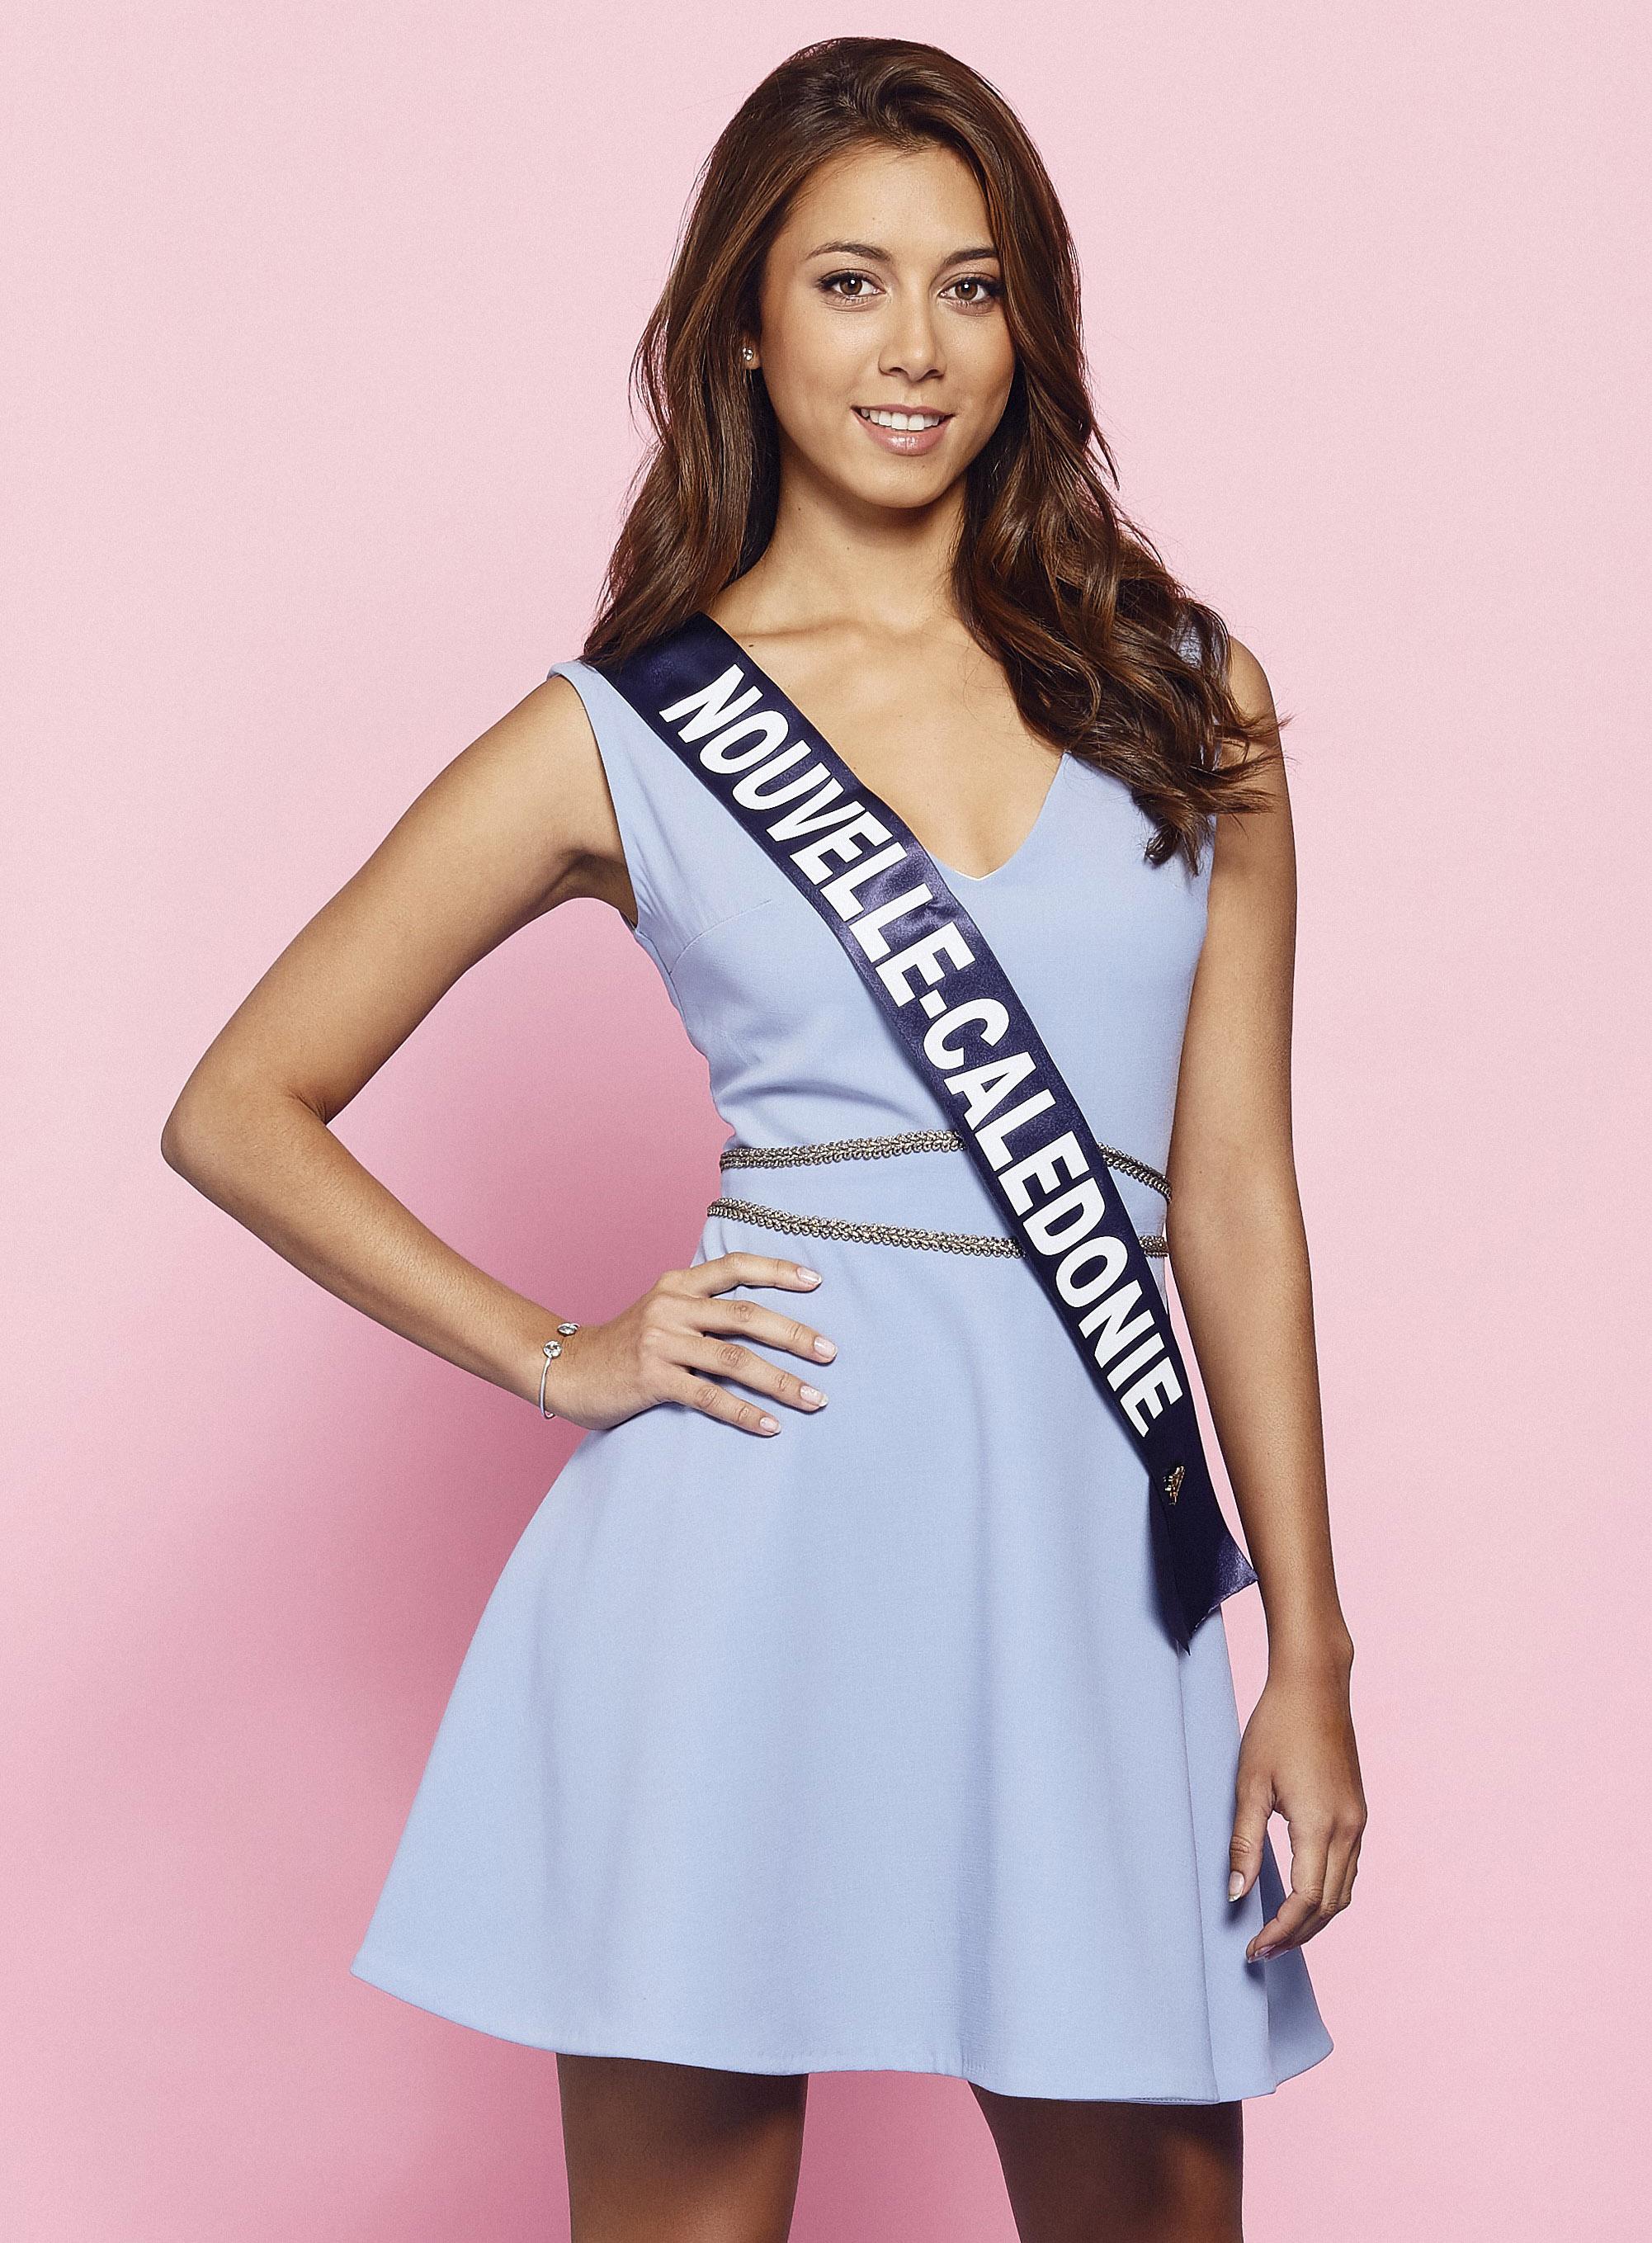 Miss Nouvelle Caledonie - Amandine Chabrier